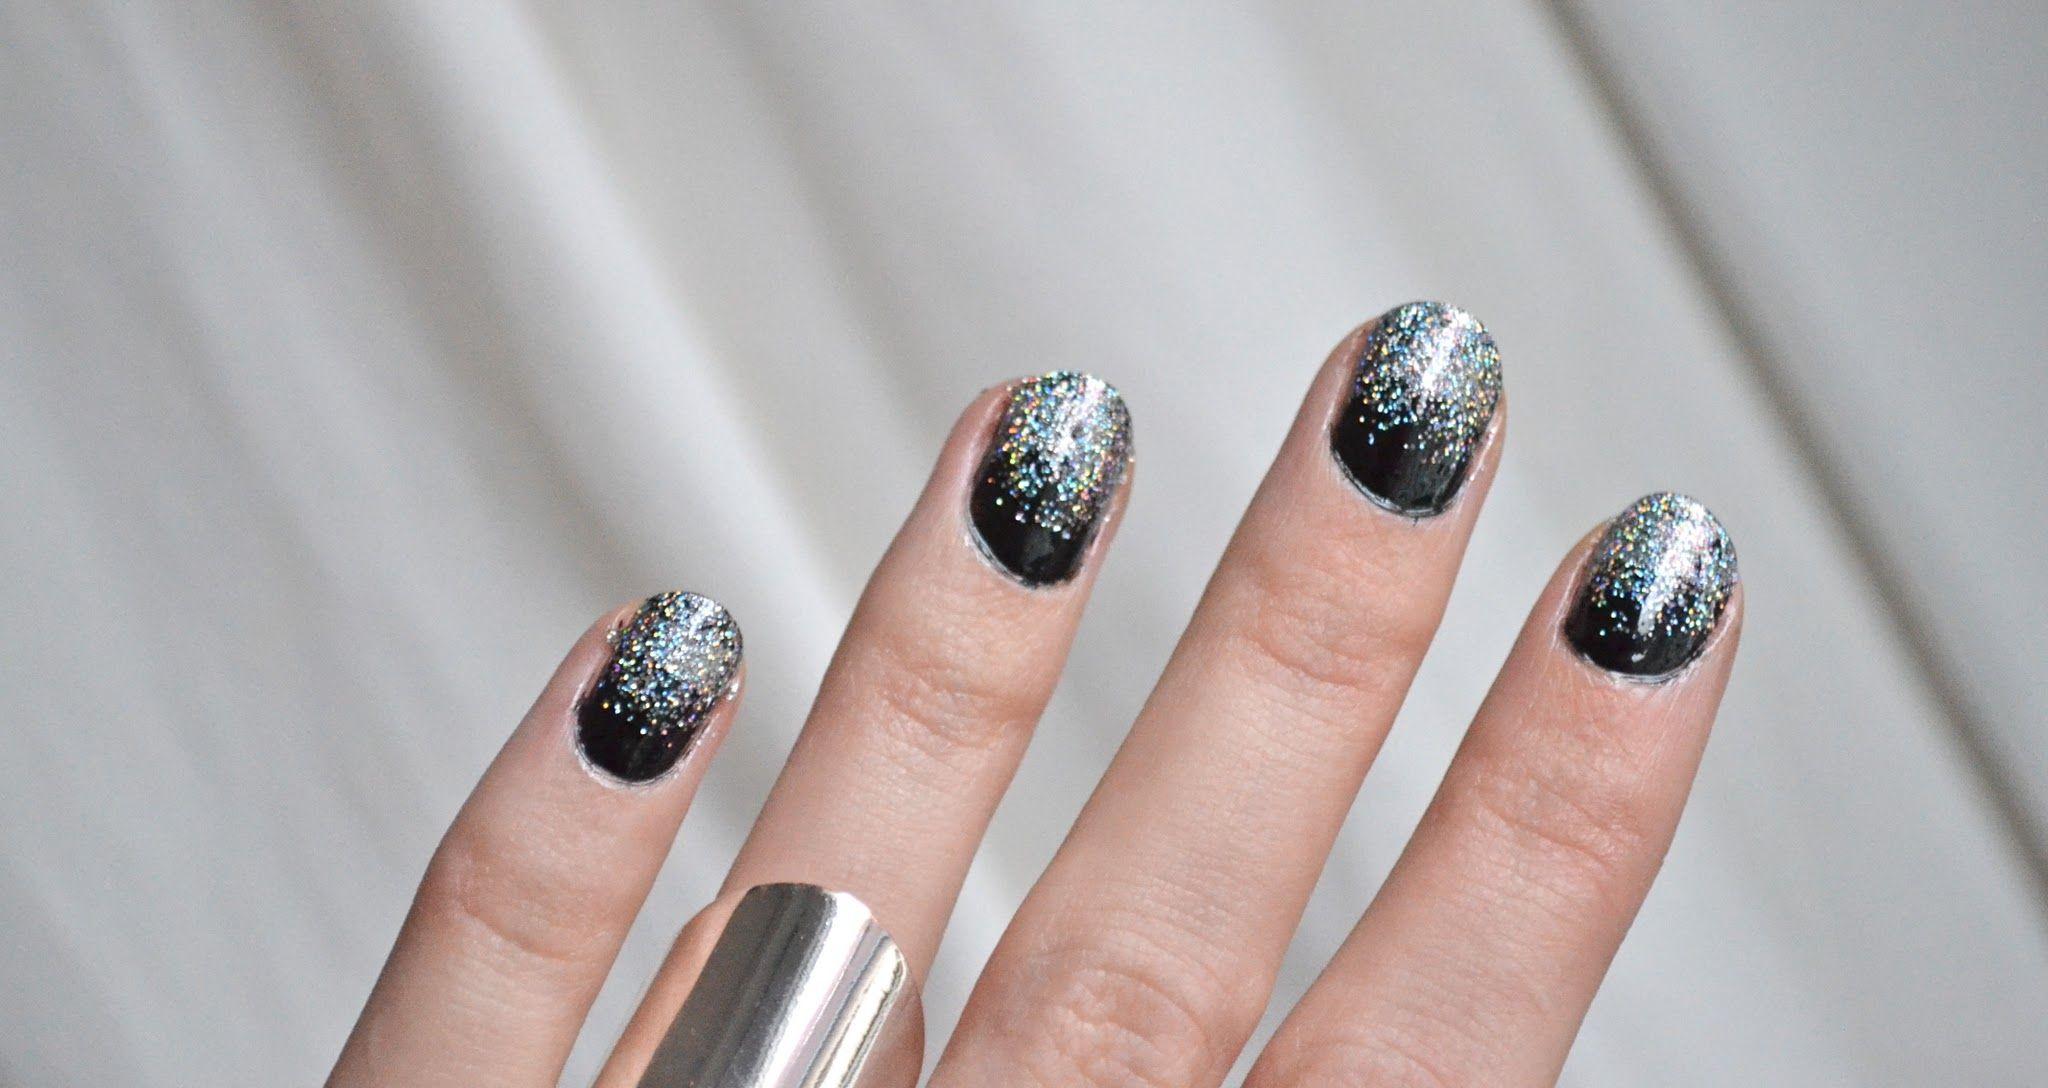 perfect+winter+nails+snow+black+silver+glitter+ombre.JPG 2,048×1,088 pixels